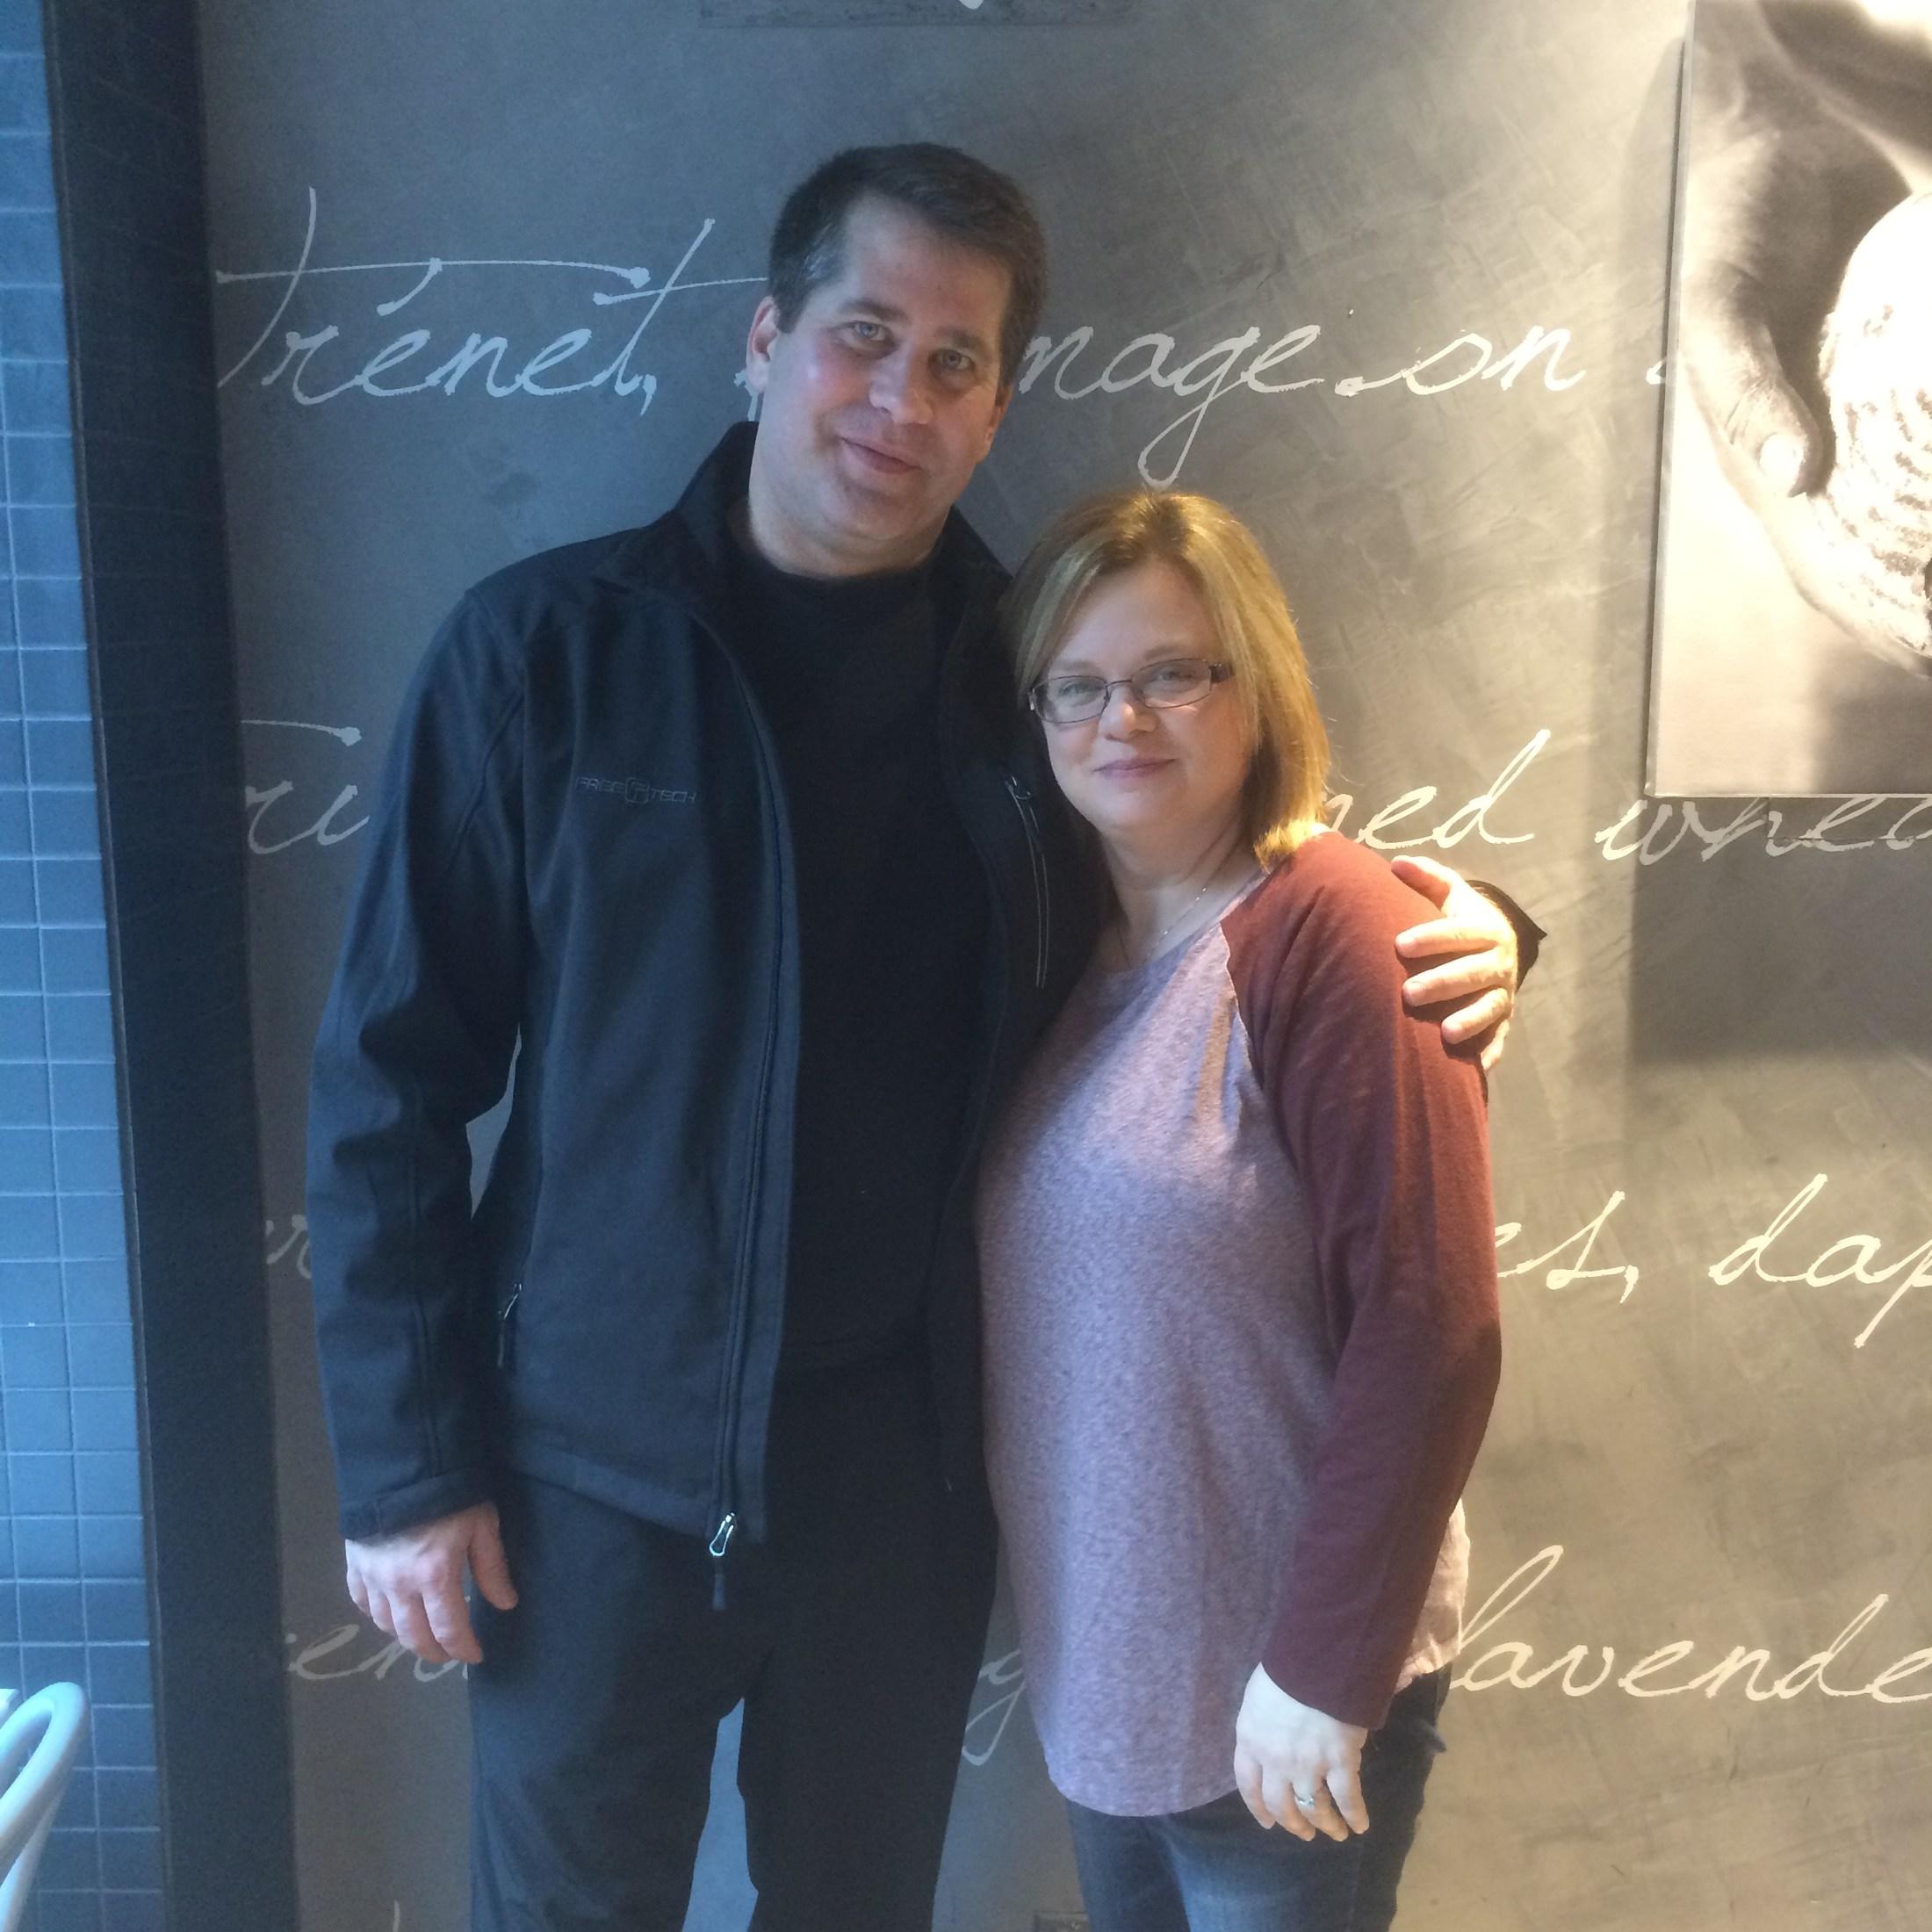 Jon and Audrey NYC 2016